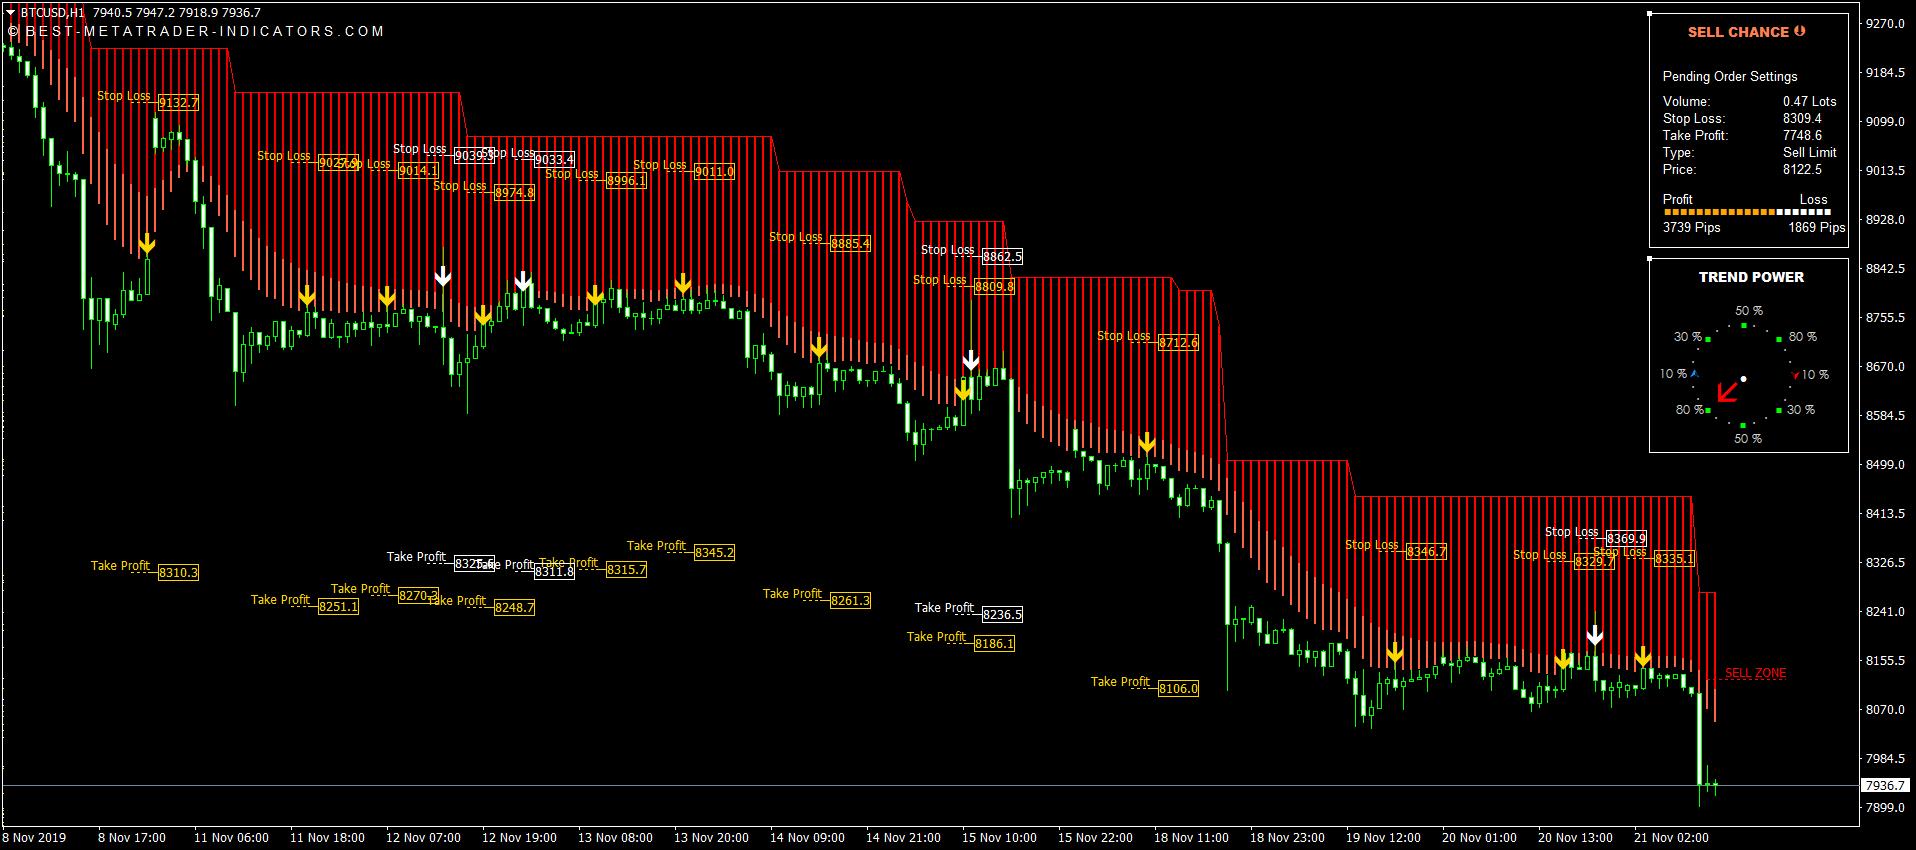 Trend Imperator V4 System